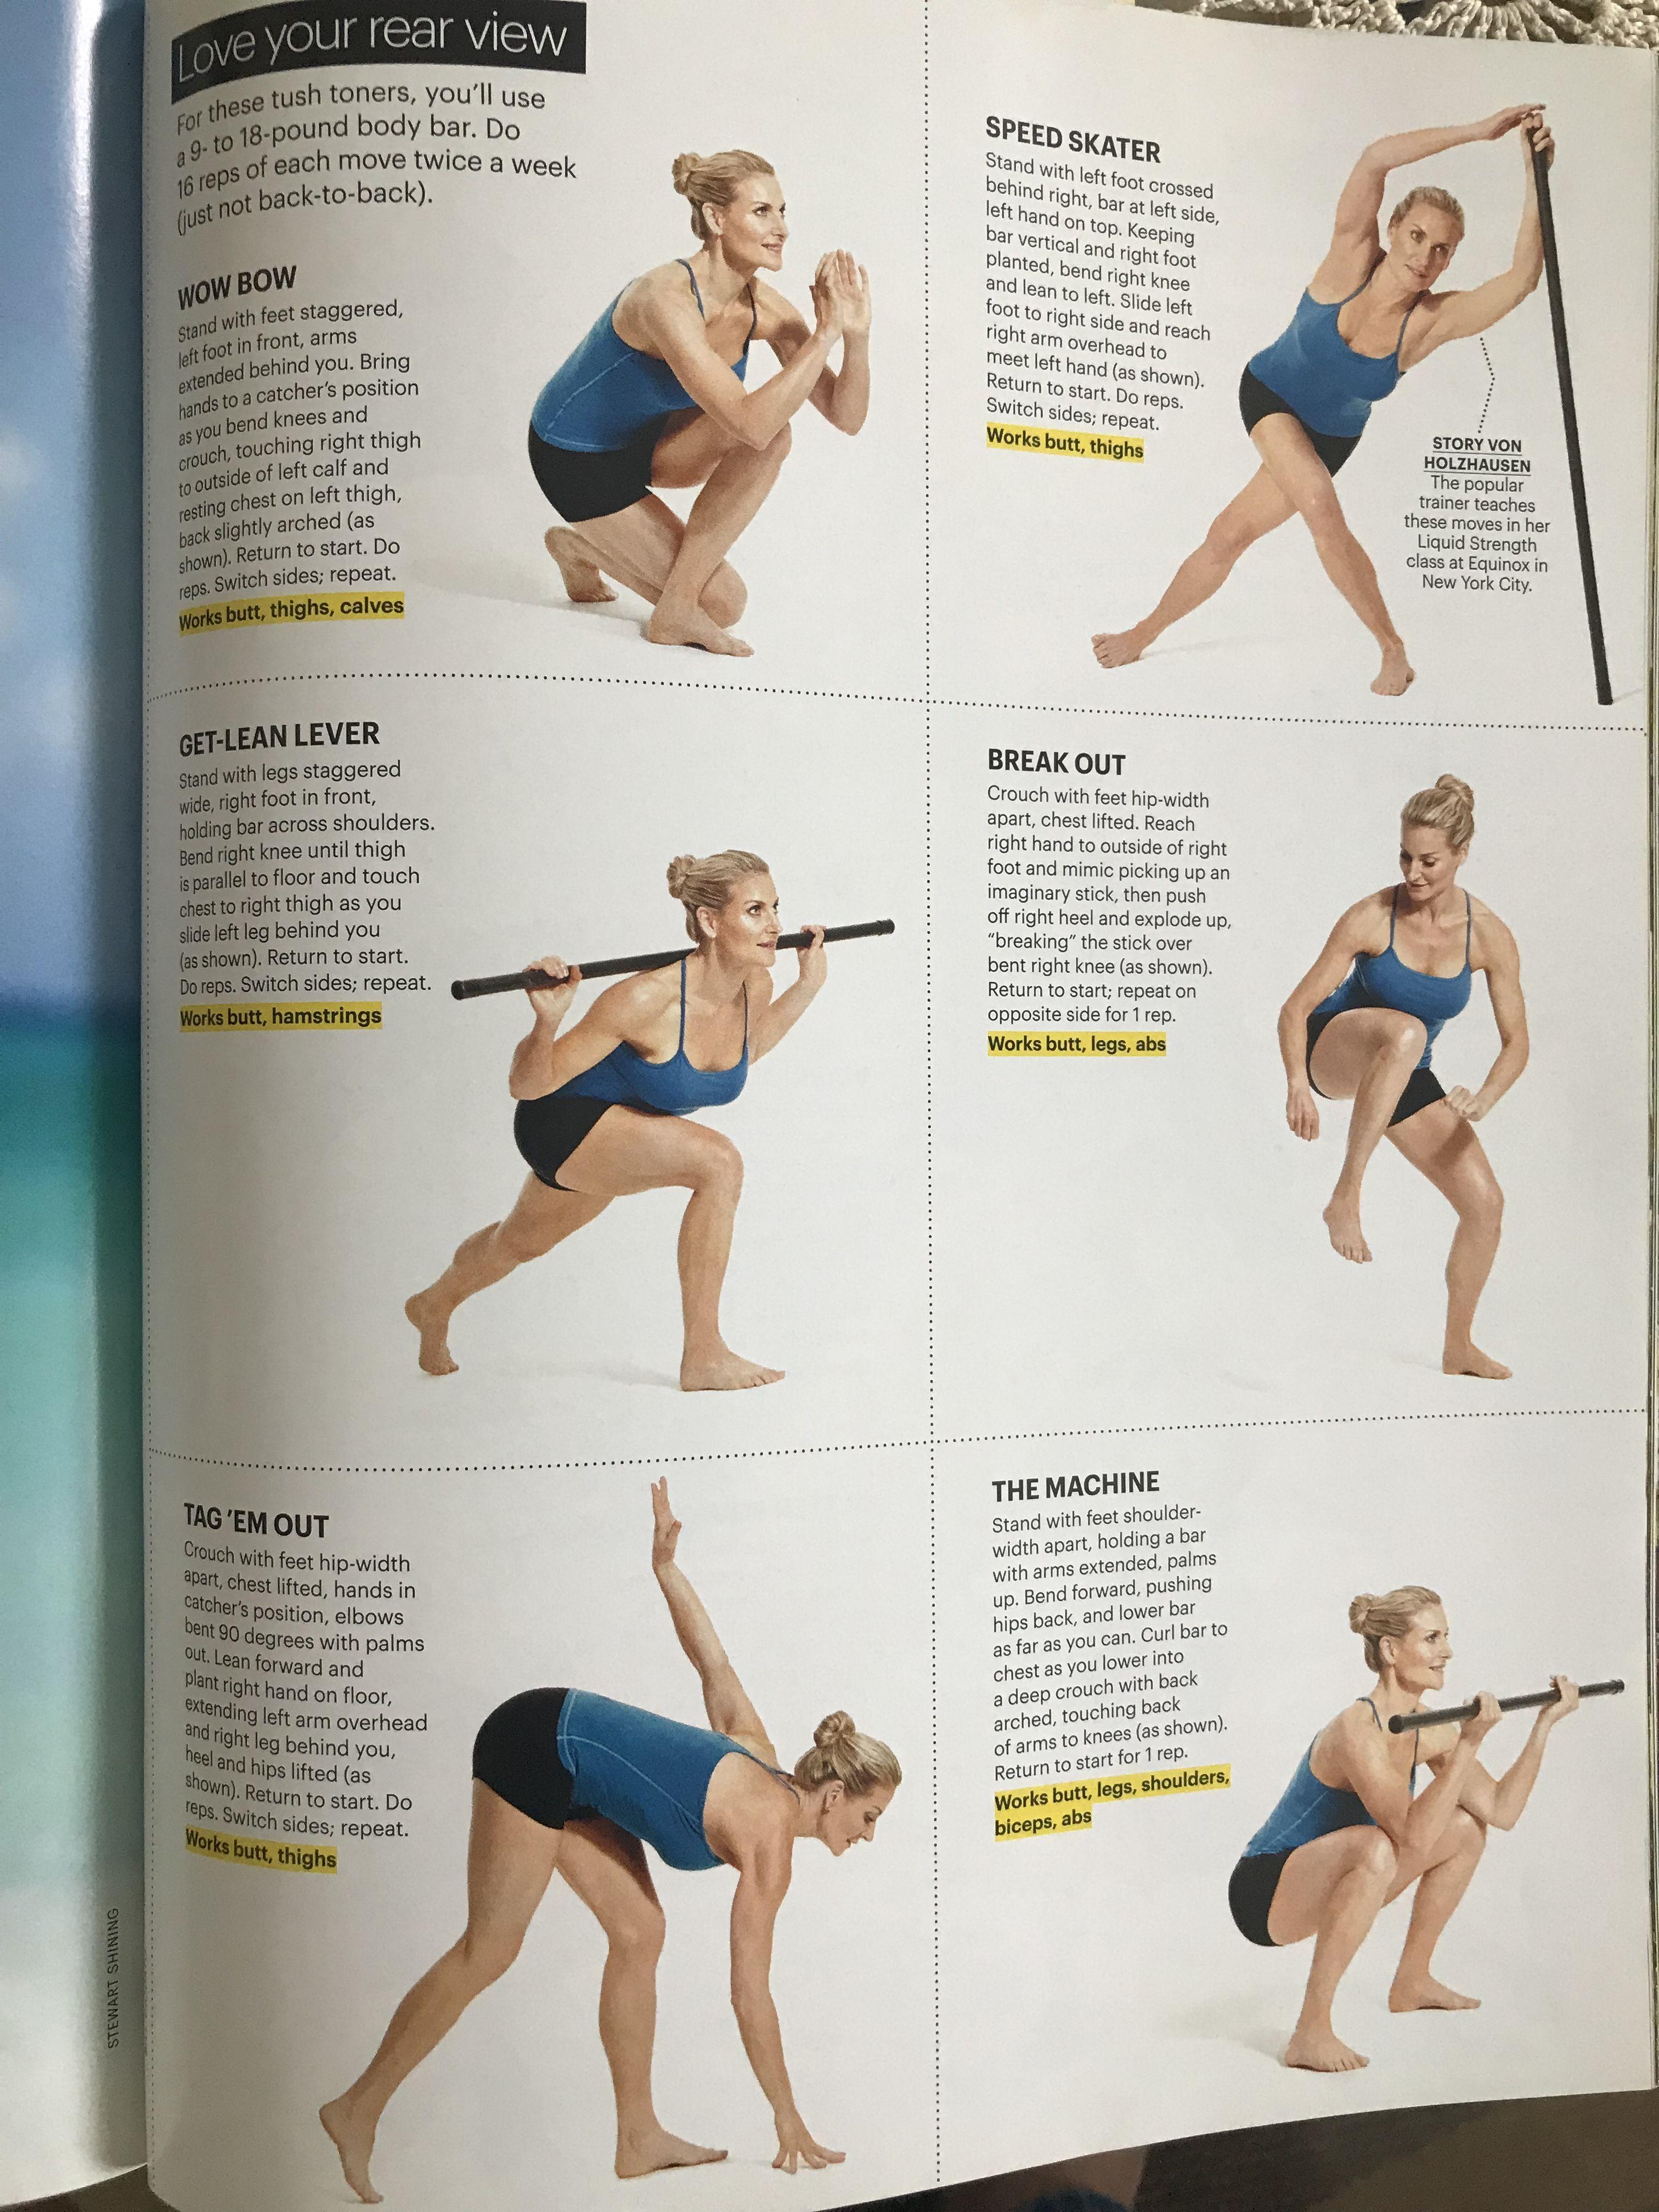 Pin By Kaska Kucharska On Make Fitness A Habit Thighs Touch Body Bars Body